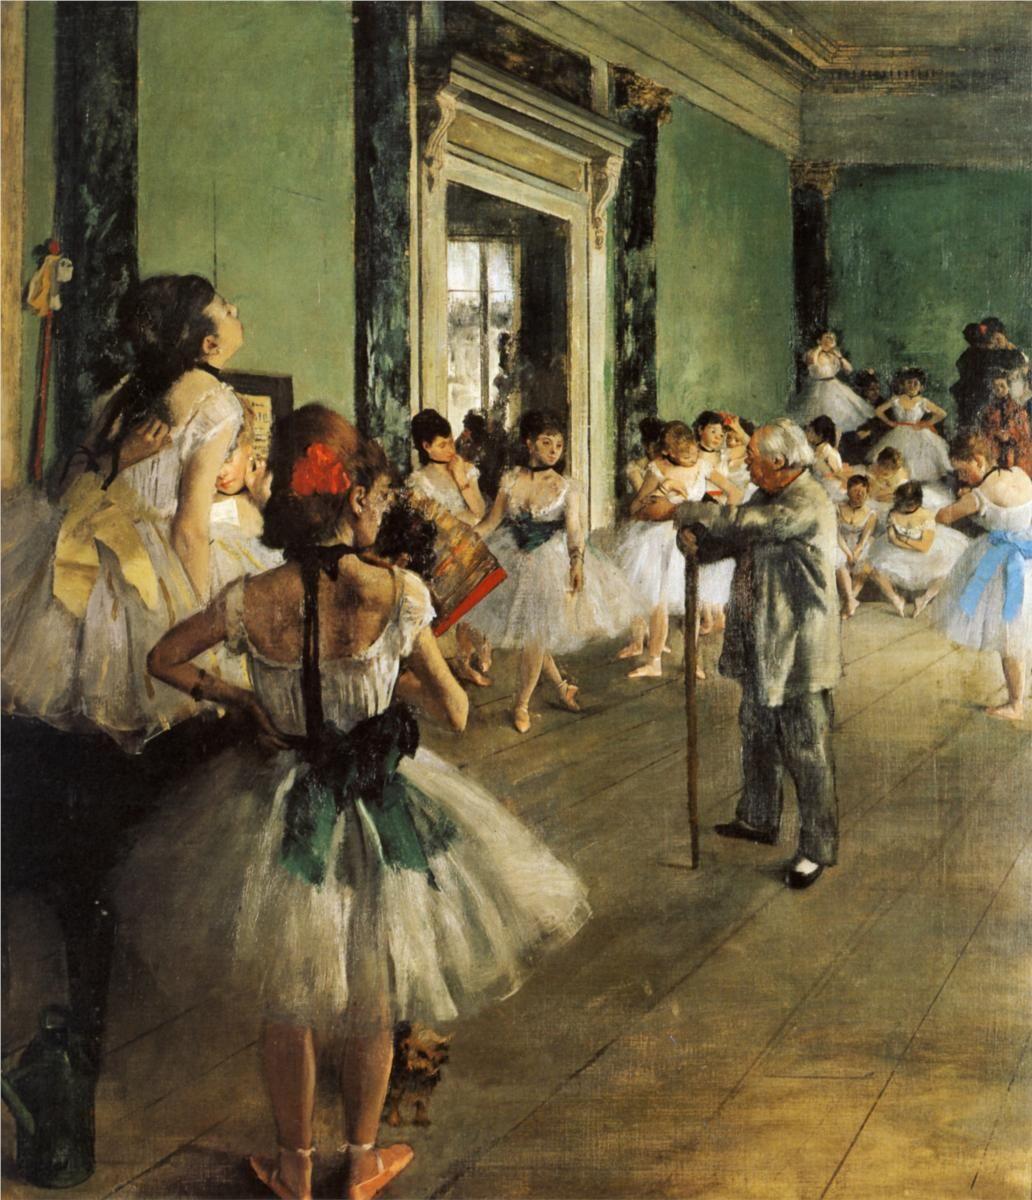 Edgar Degas: The Ballet Class, 1871-1874.